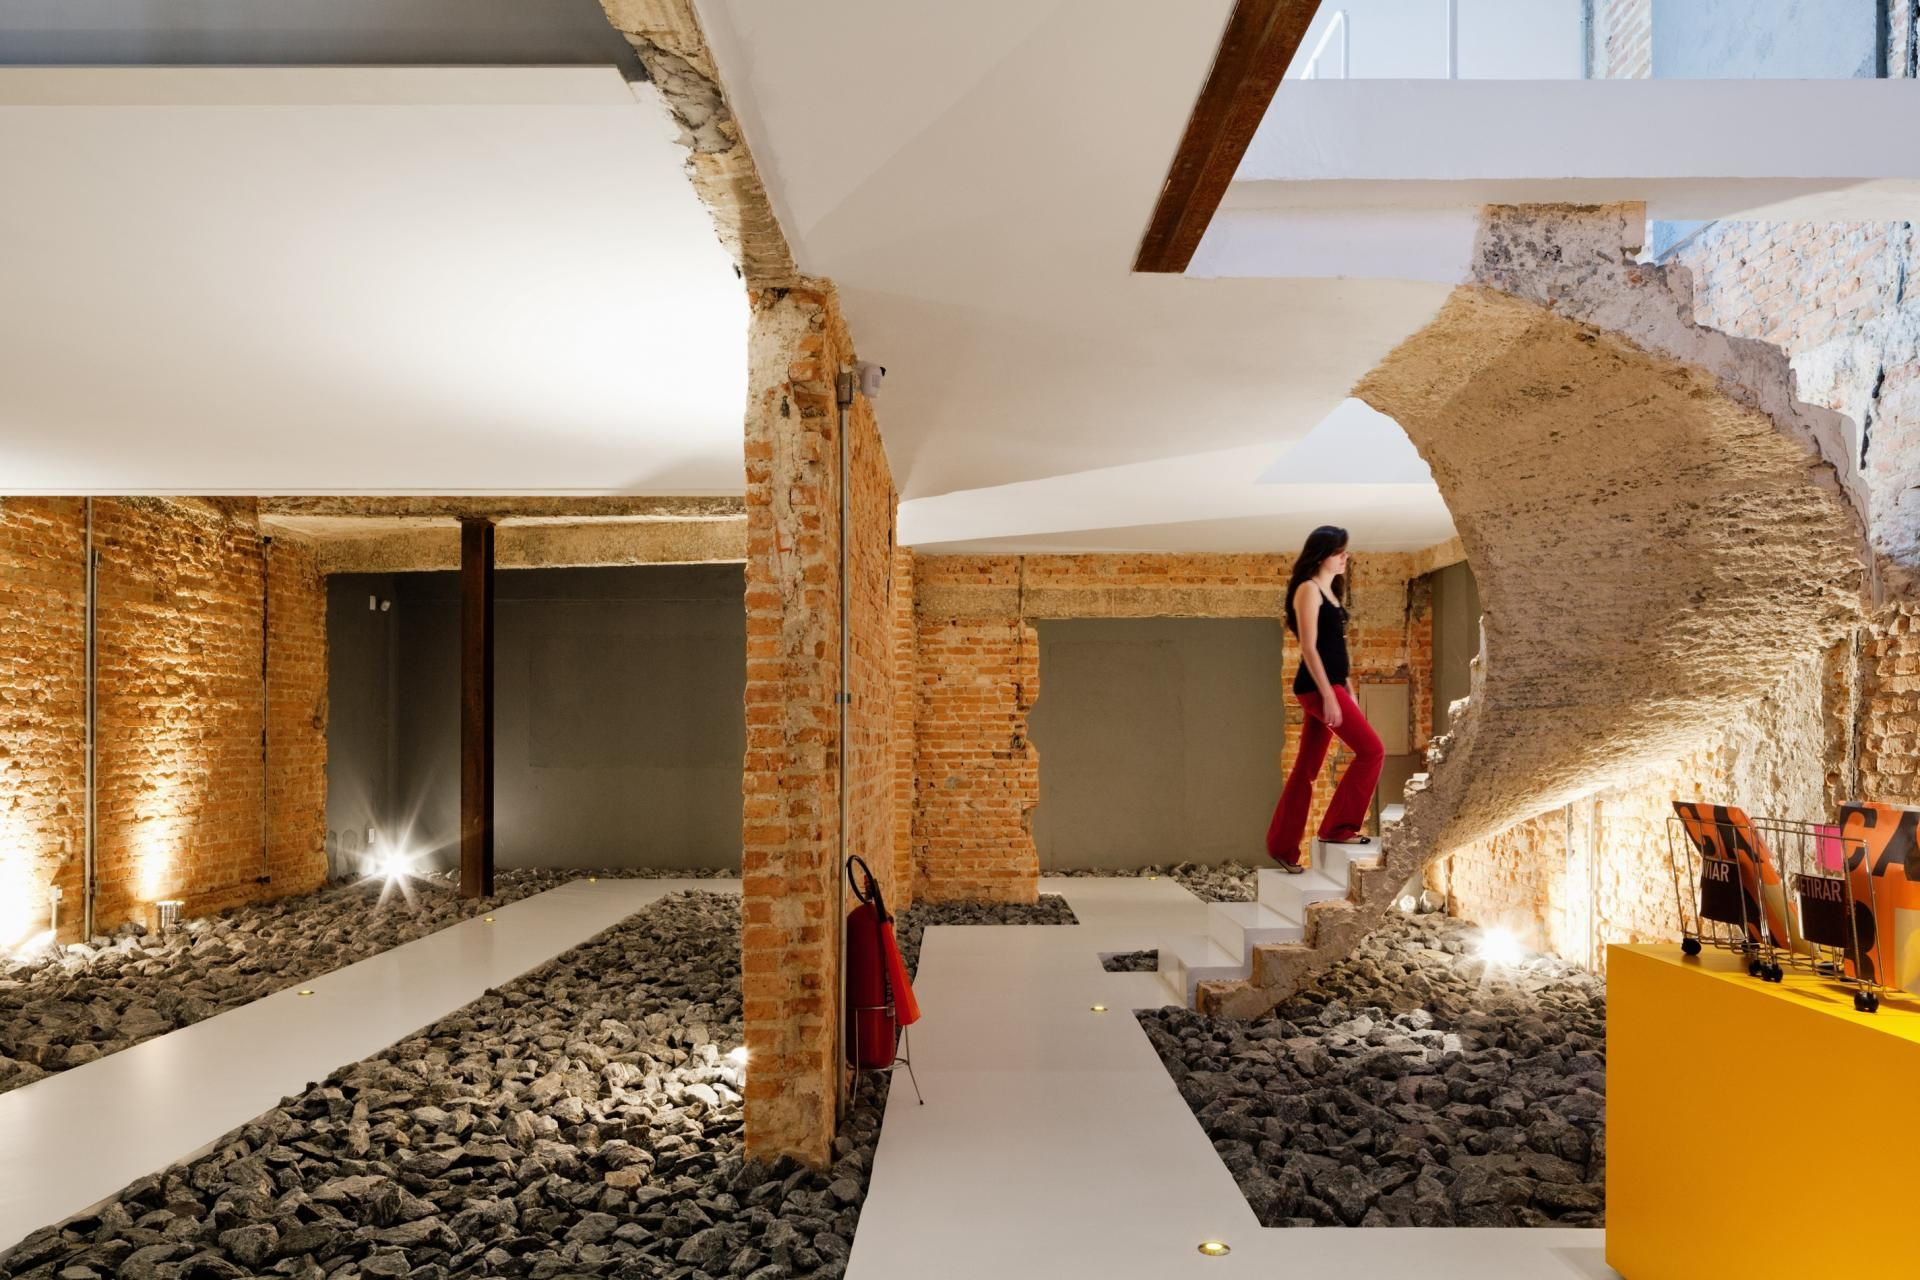 Rafaela netto dream designs interiors pinterest